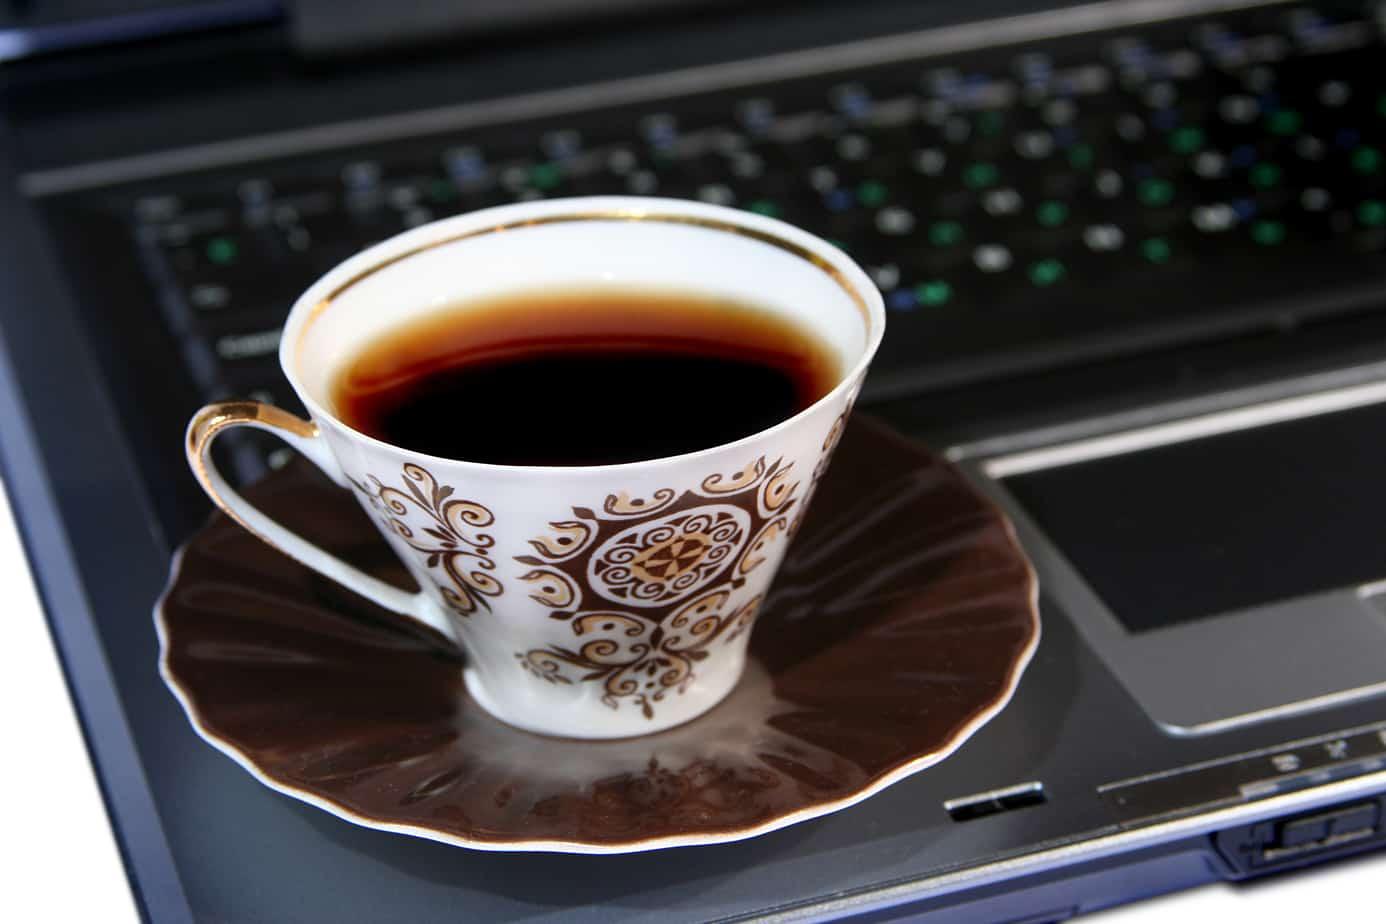 Frederick County Internet Cafes/WiFi Hotspots